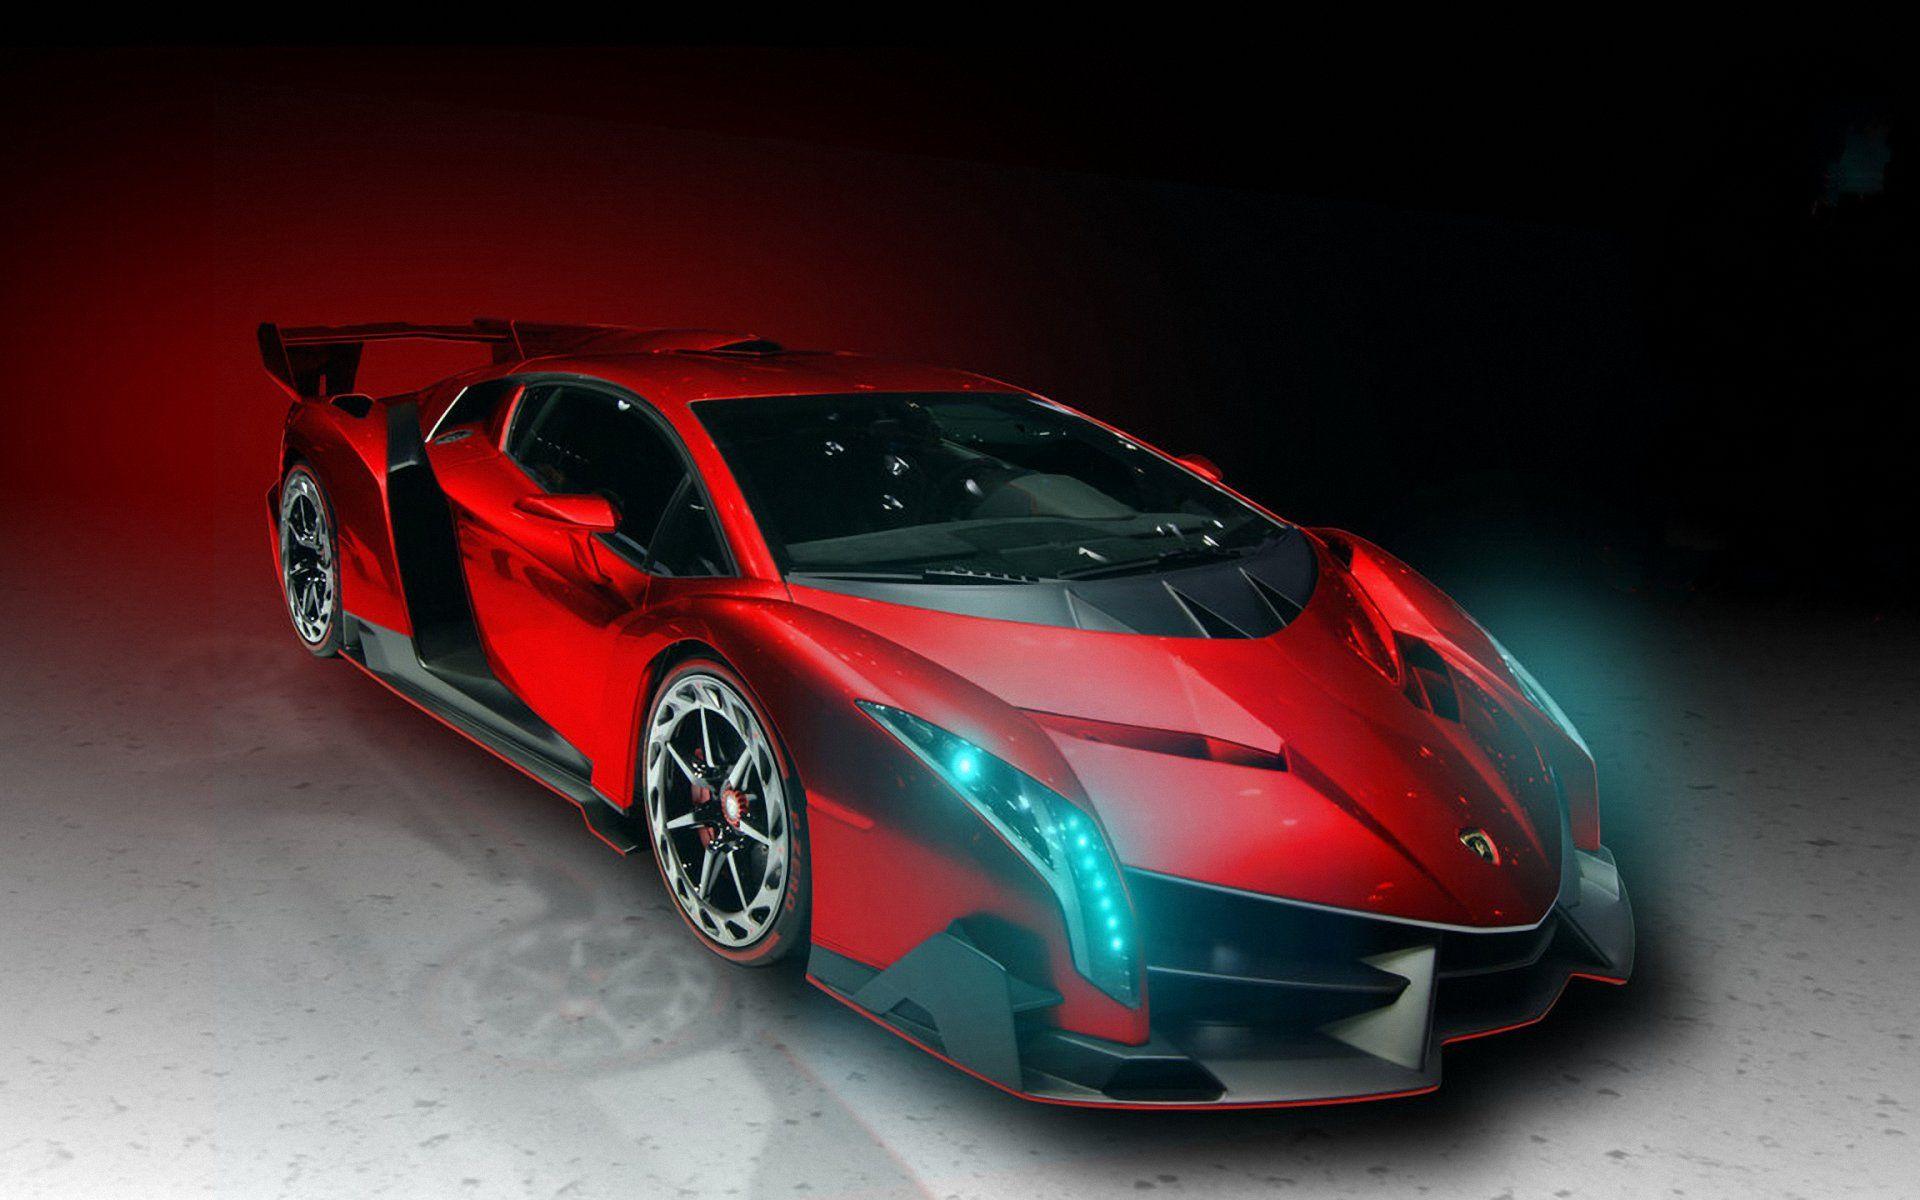 Lamborghini Veneno Roadster Wallpaper Widescreen Hd Wallpaper Lamborghini Veneno Car Wallpapers Red Lamborghini